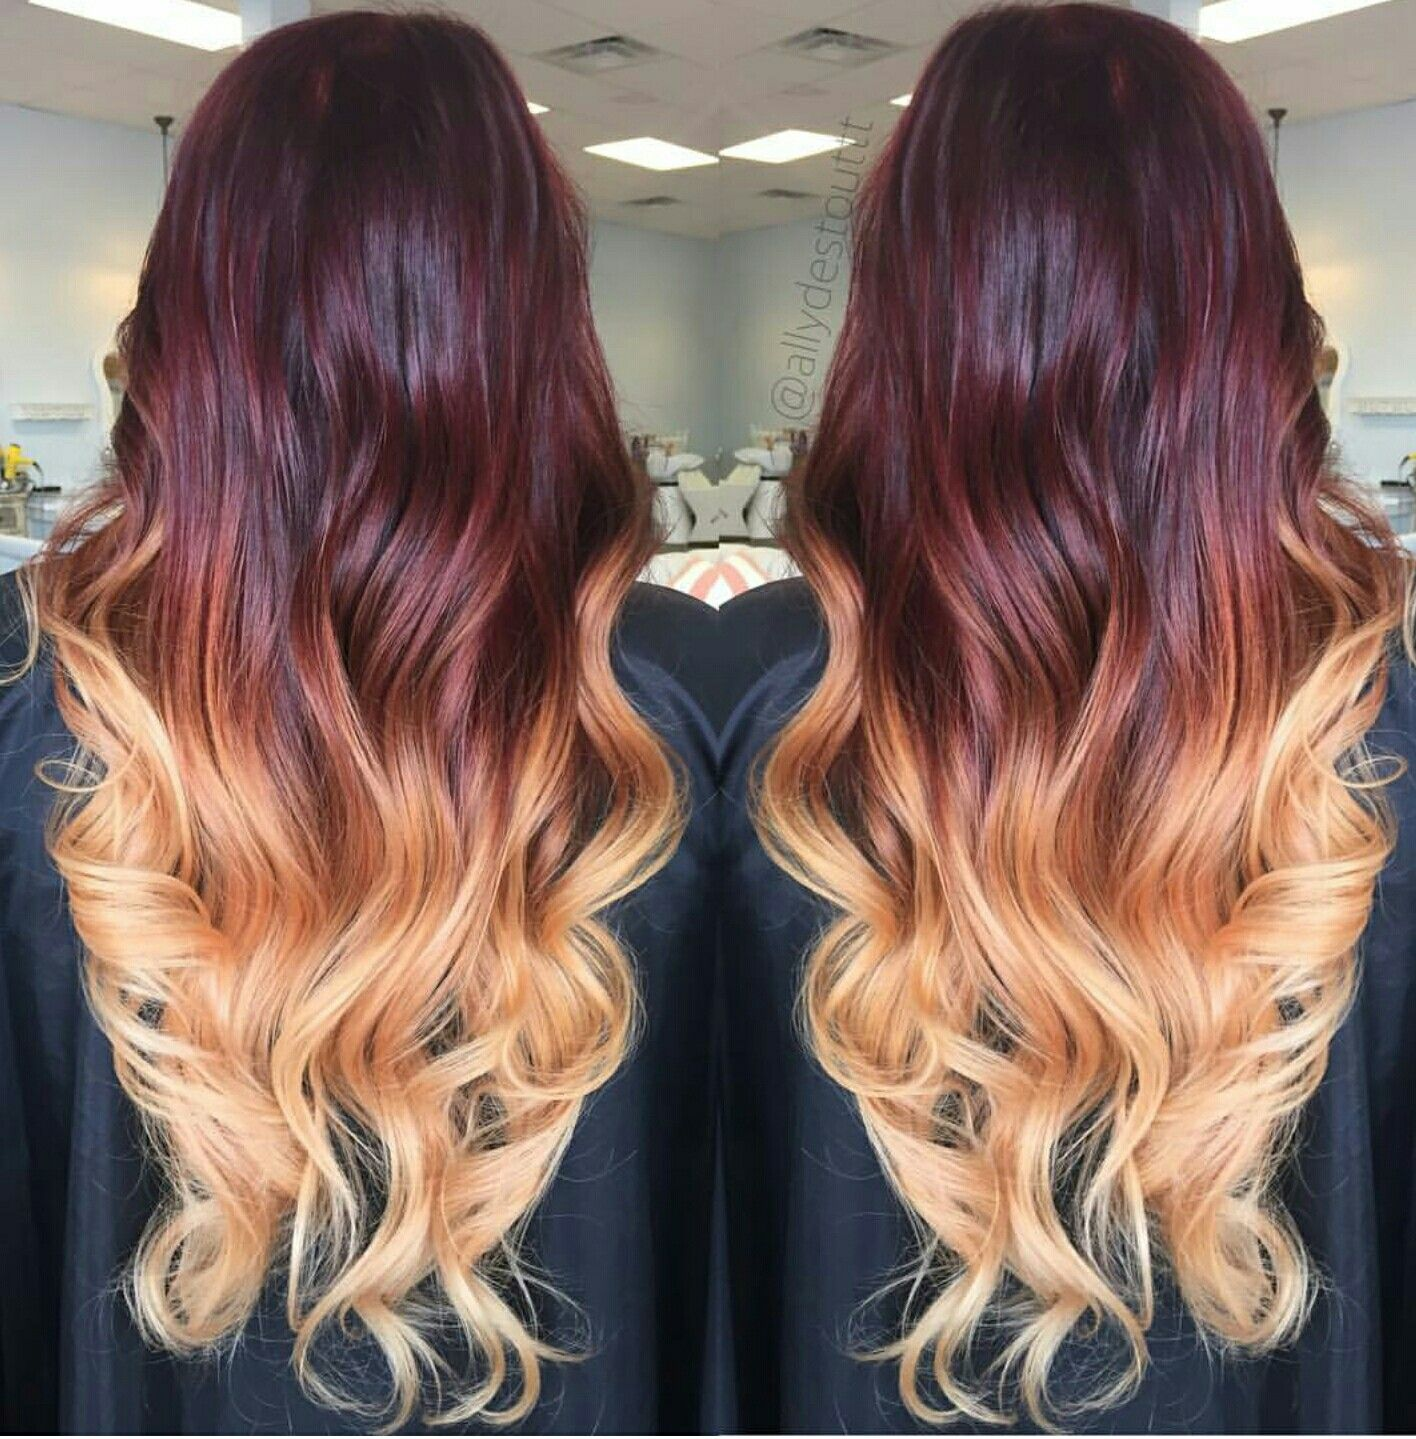 Mahogany To Blonde Ombre Burgundy Hair Hair Color Burgundy Hair Color Dark